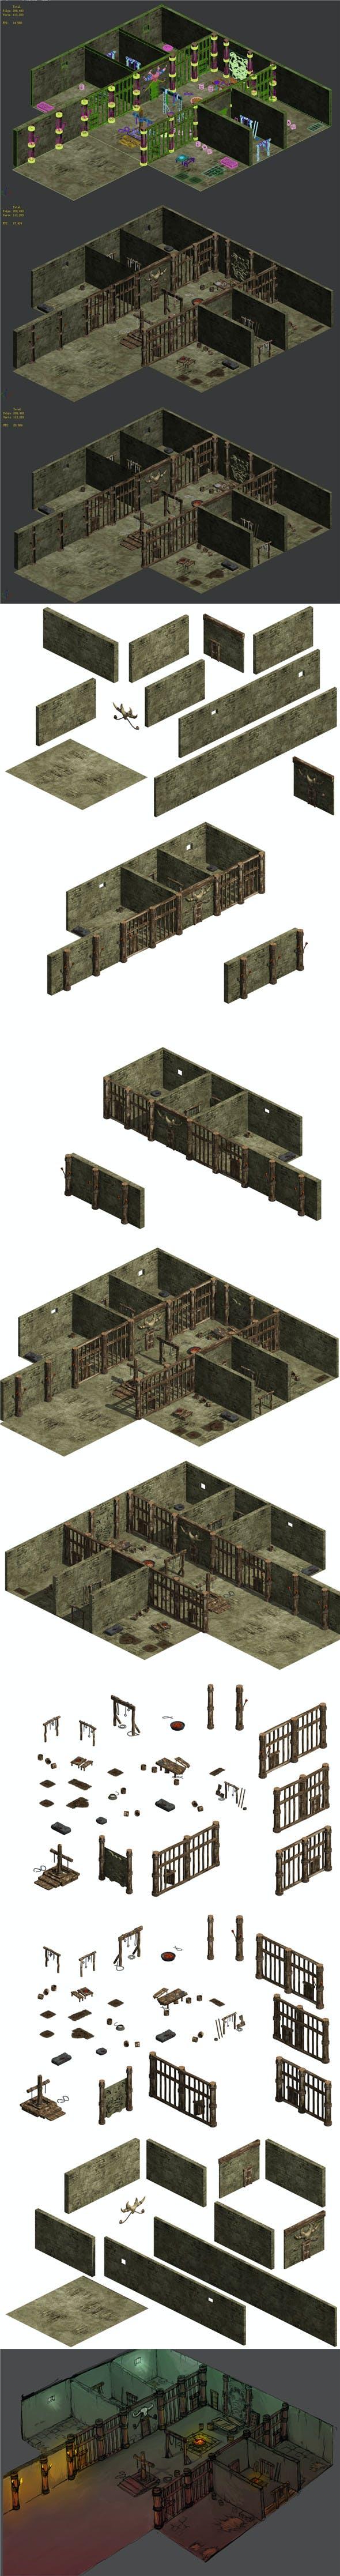 Prison 03 - 3DOcean Item for Sale